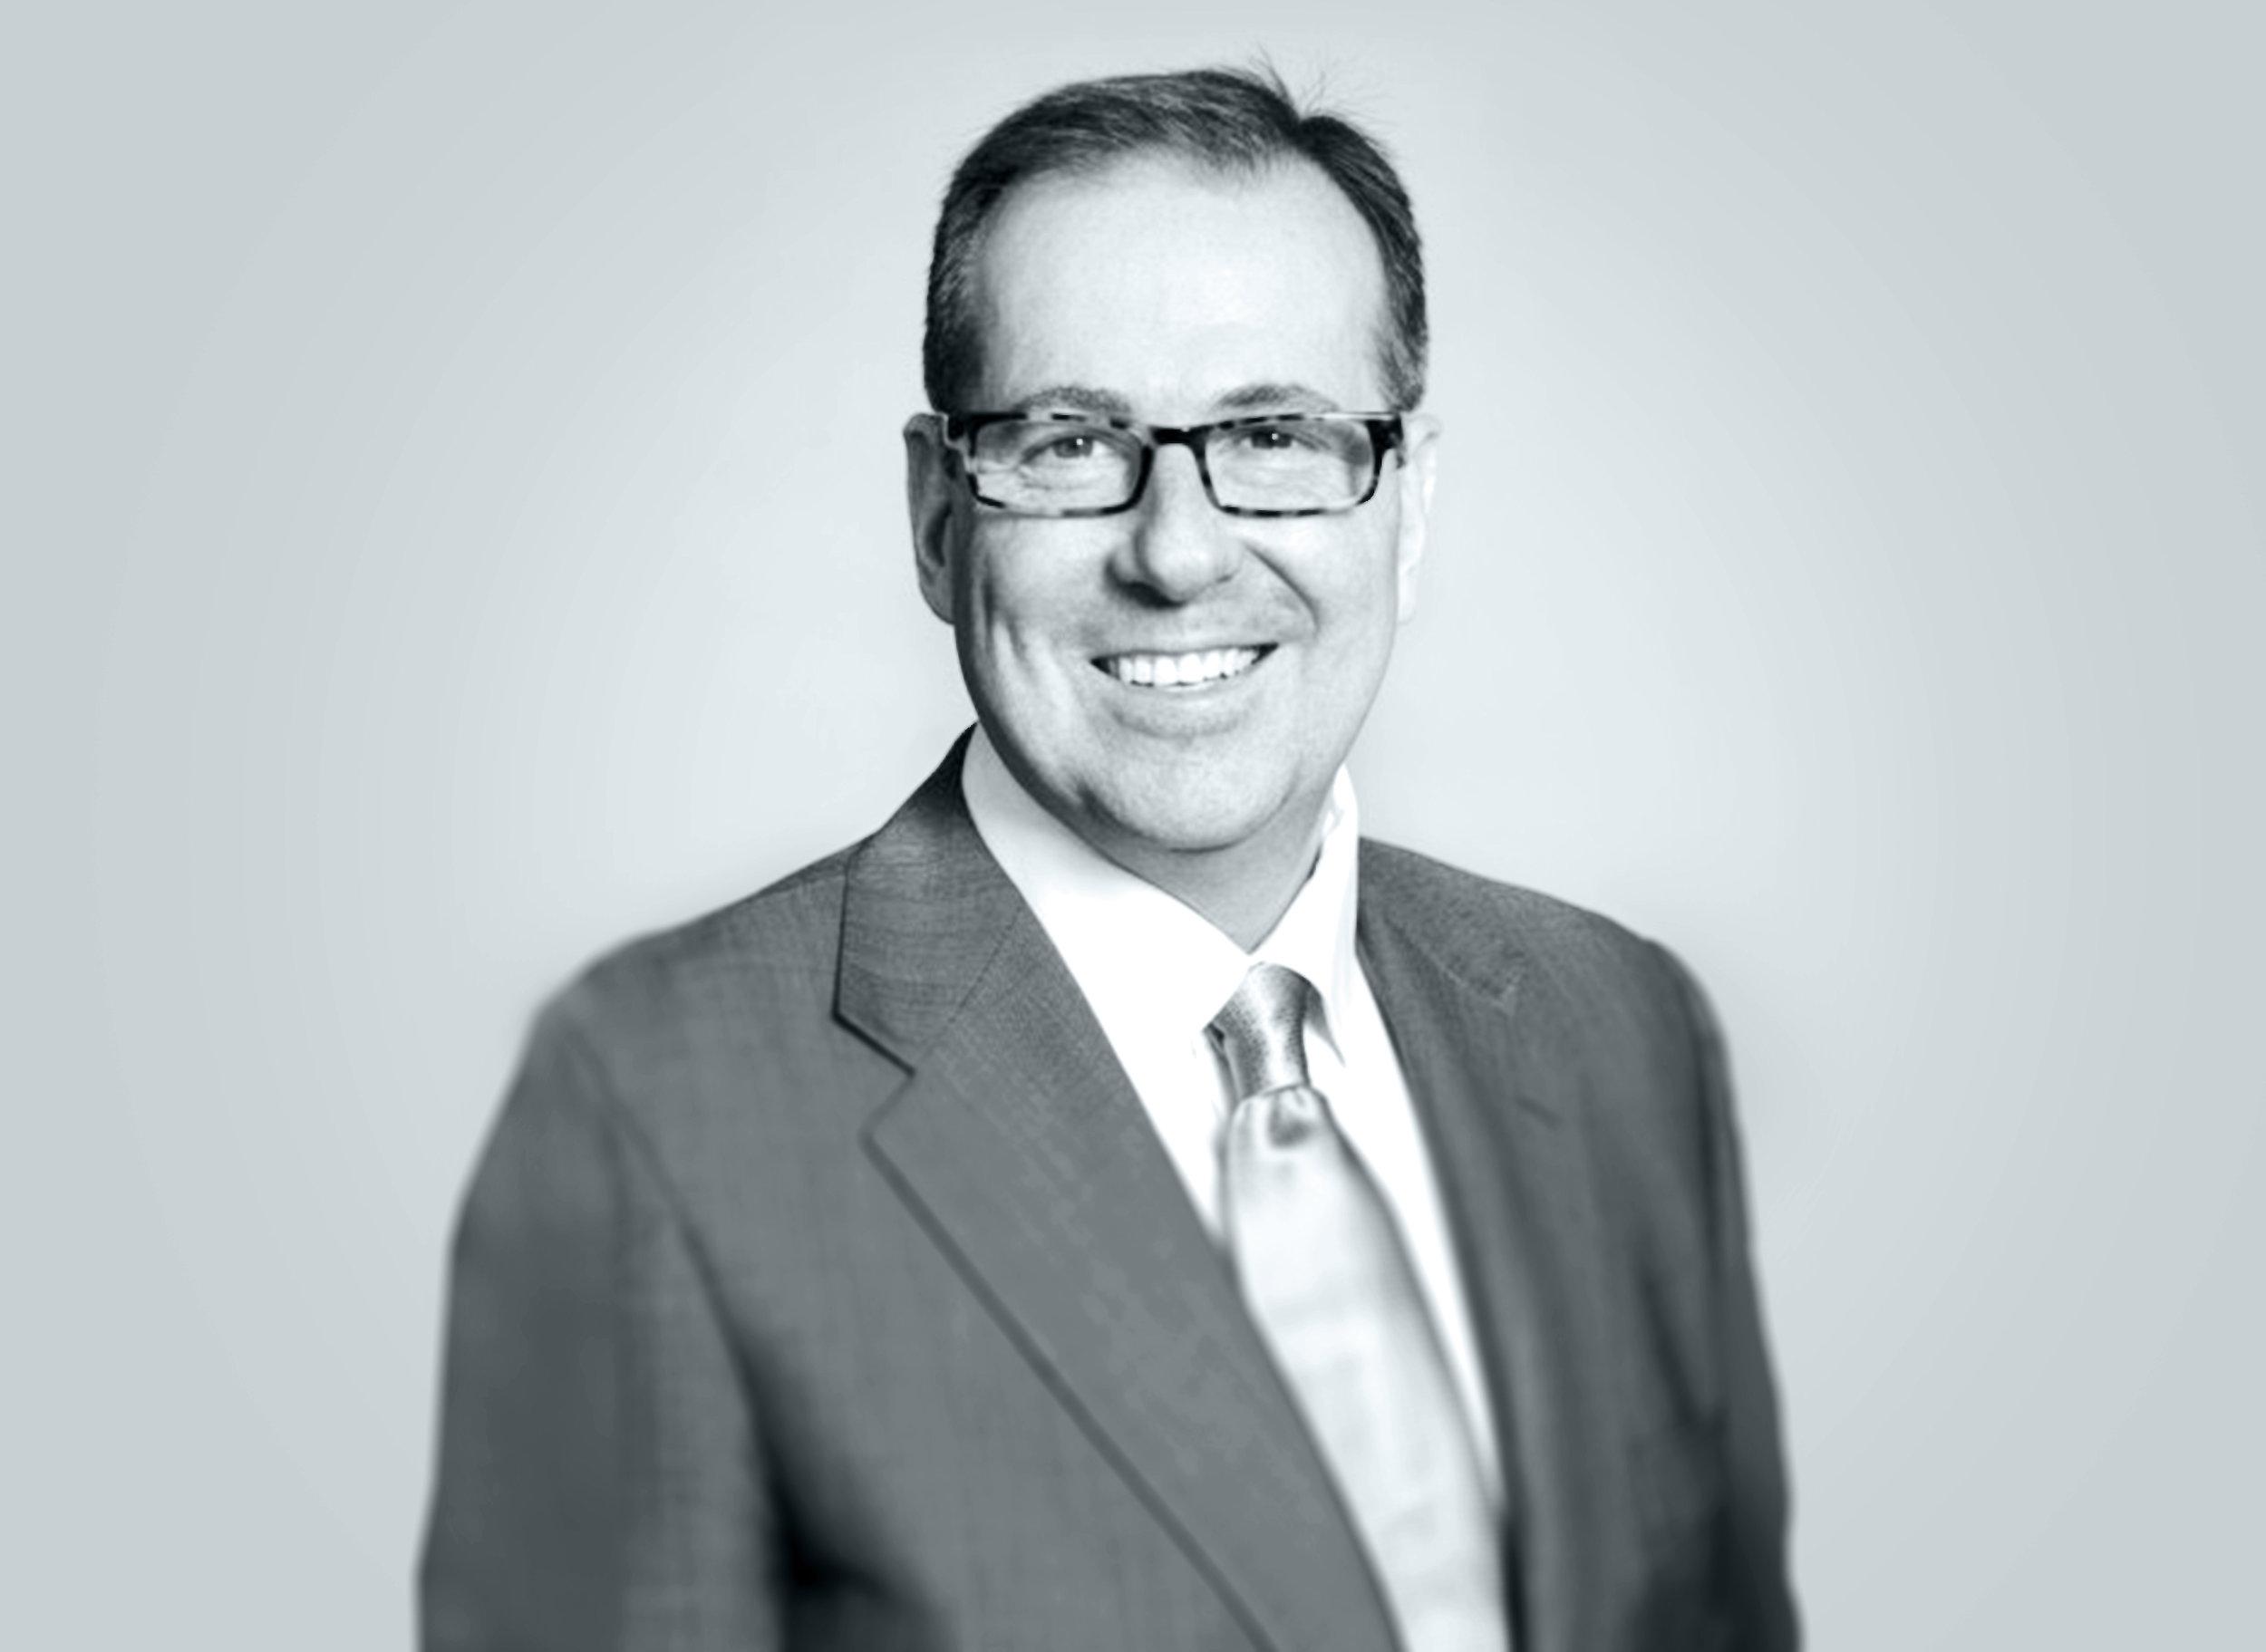 Mark Vargo – Strategic Advisor, Cameron Barney